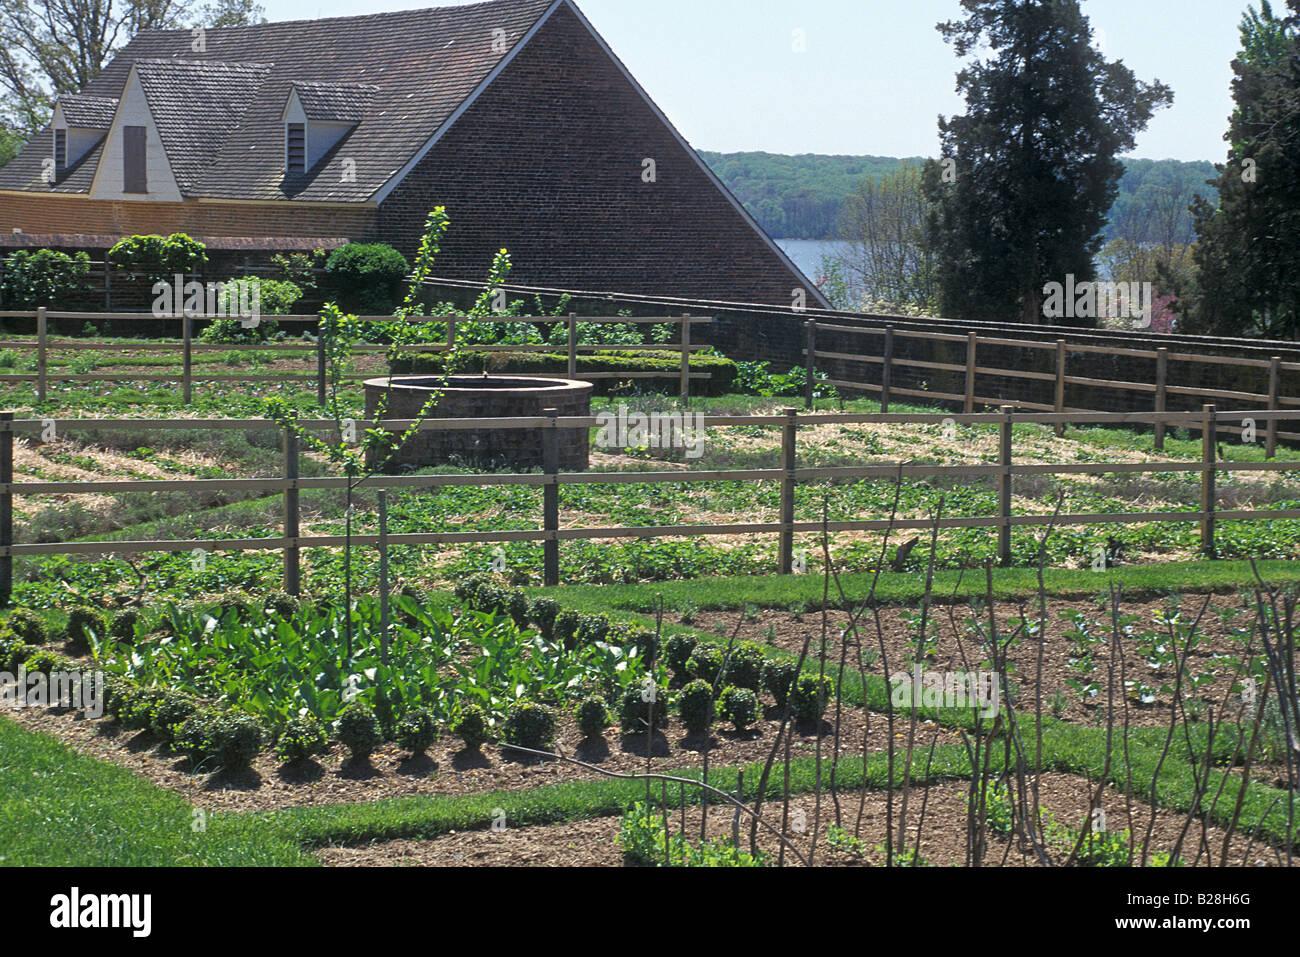 Vegetable Garden At Mount Vernon George Washington Home In